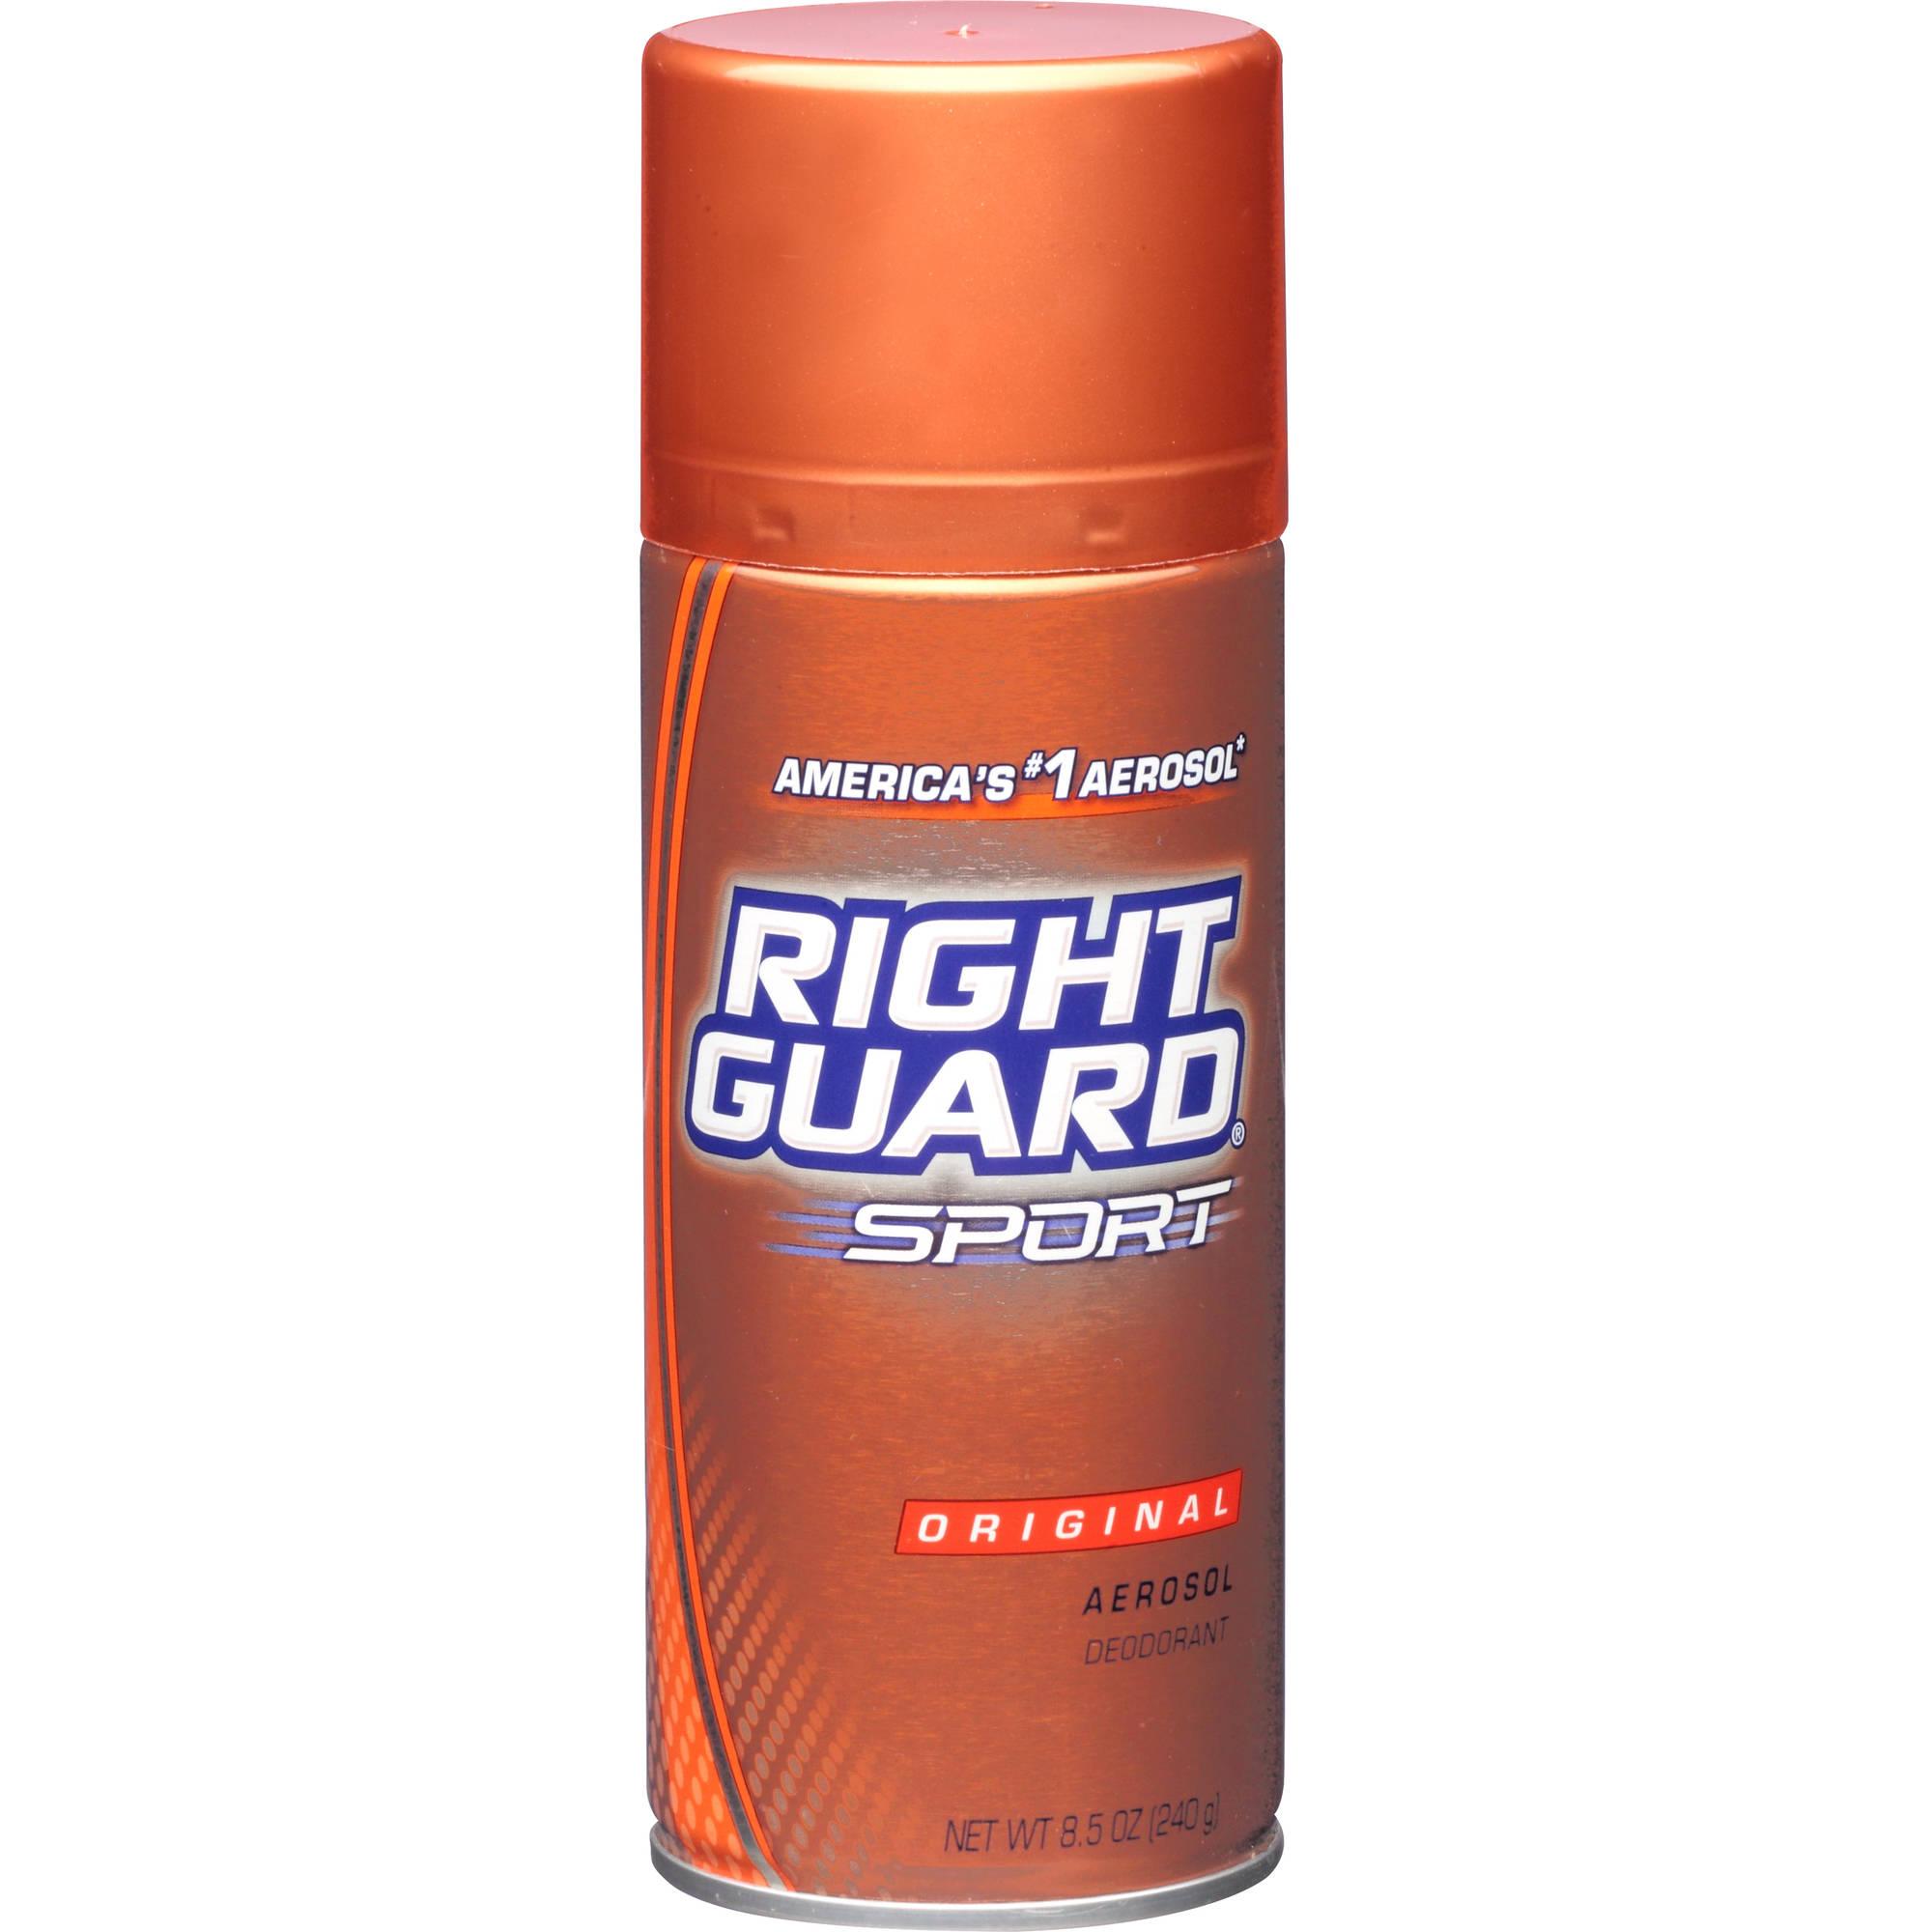 Right Guard Sport Original Deodorant, 8 oz